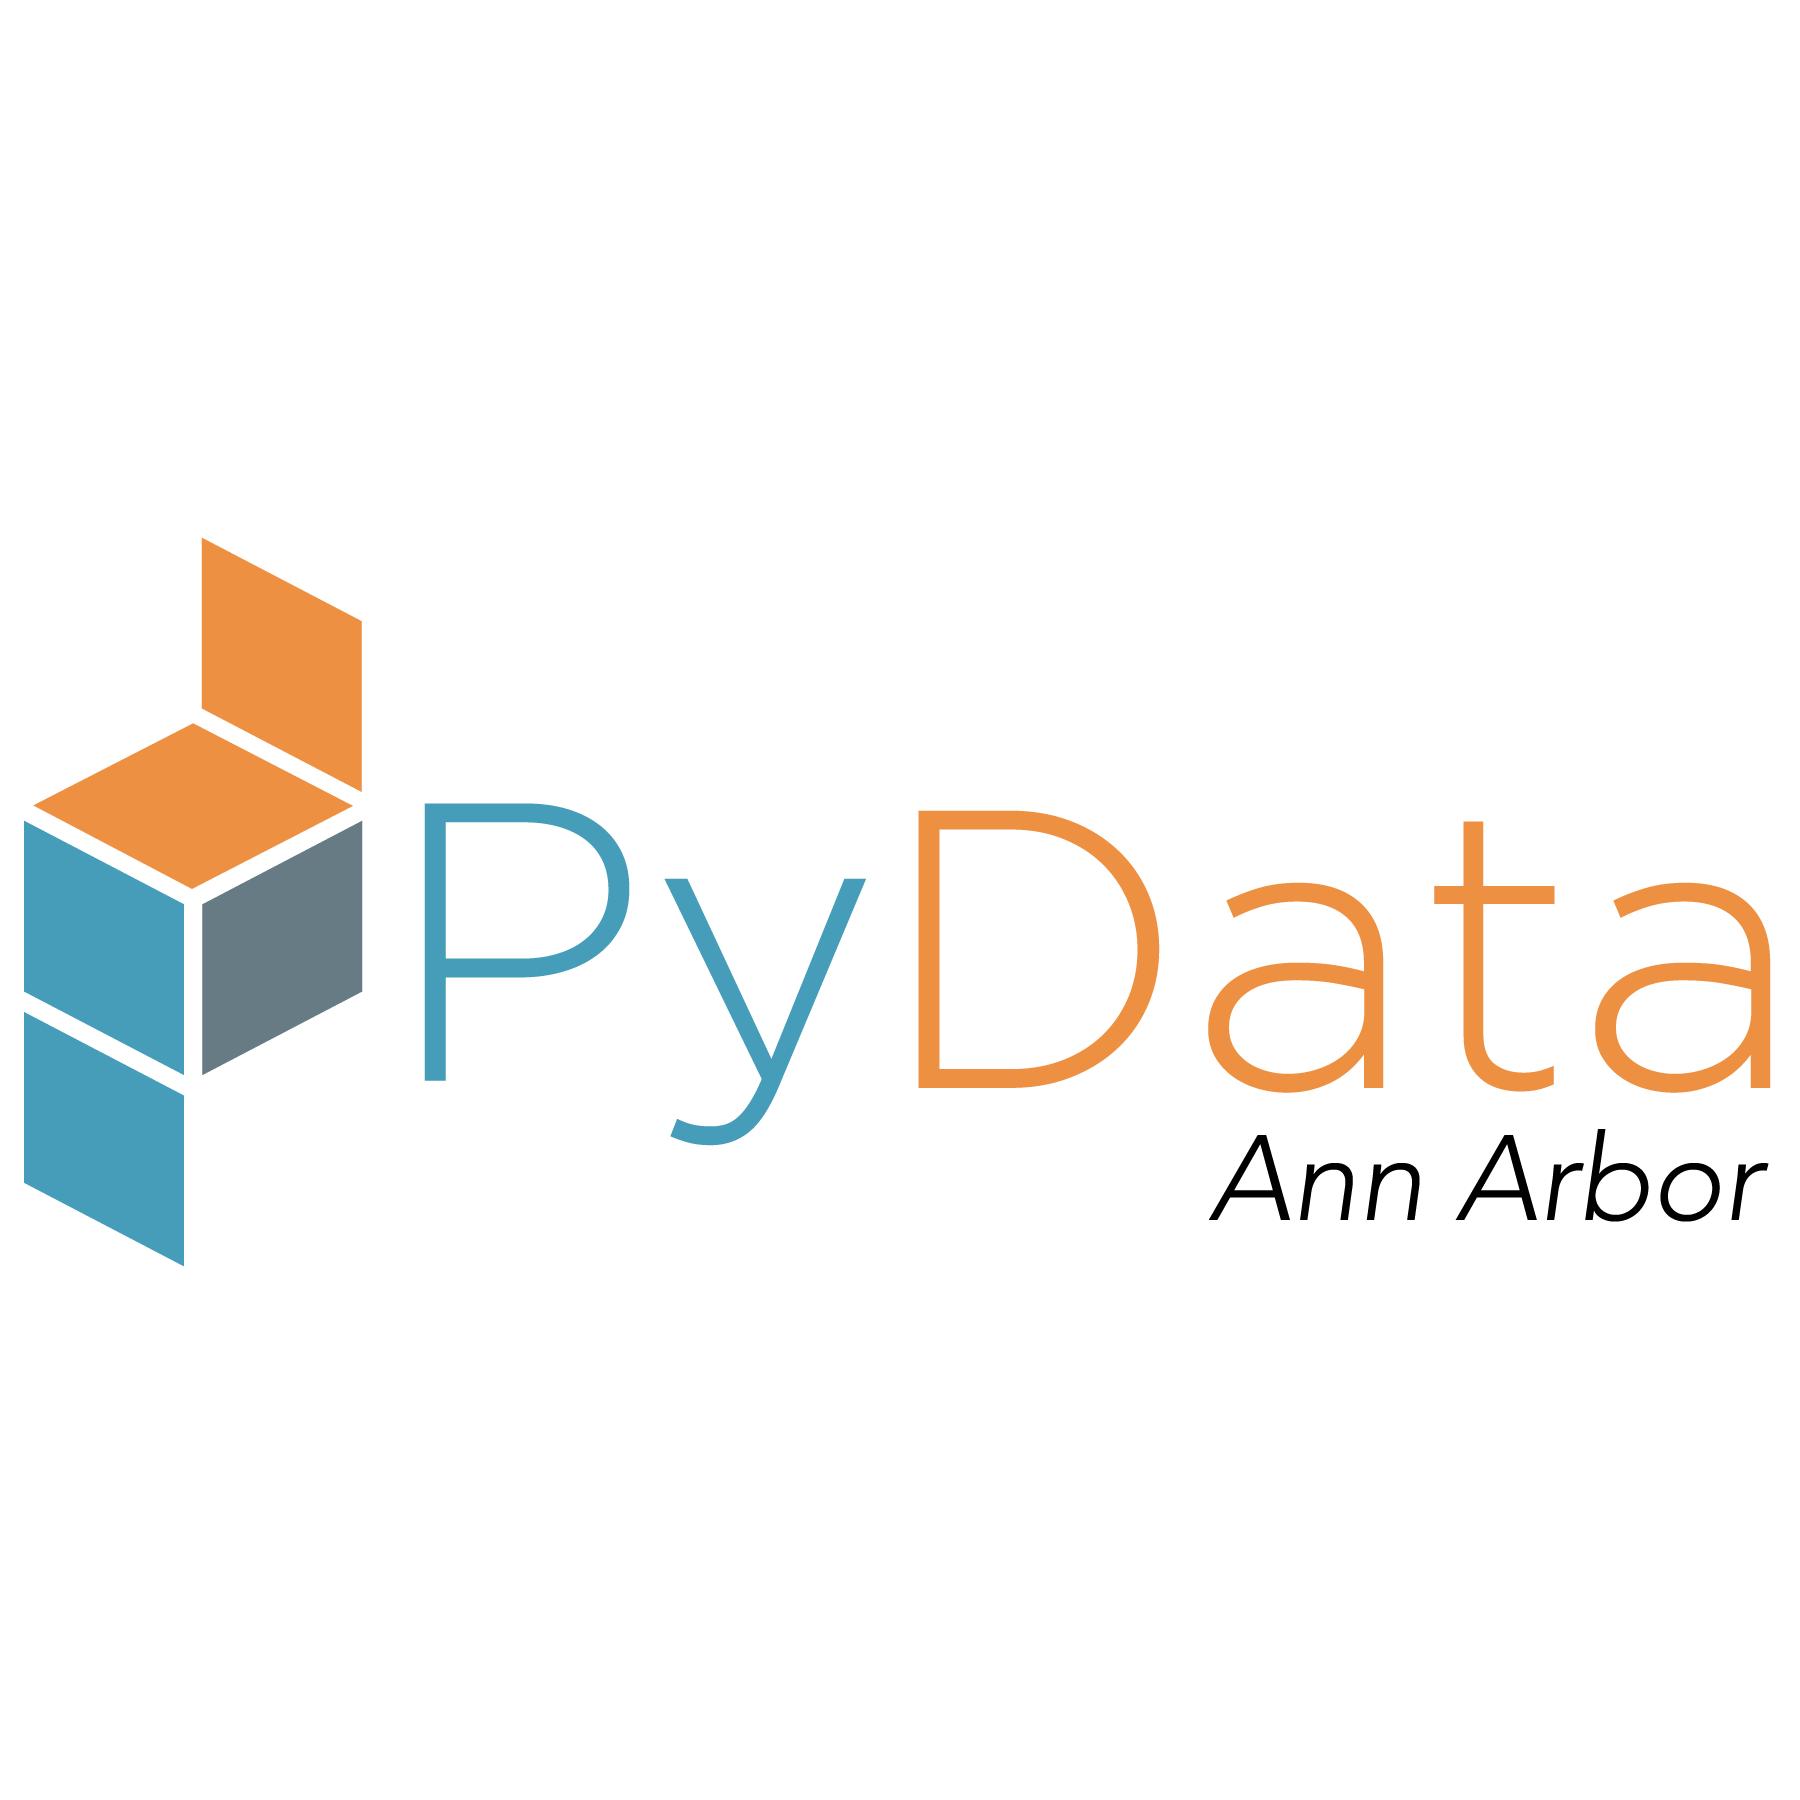 PyData Ann Arbor